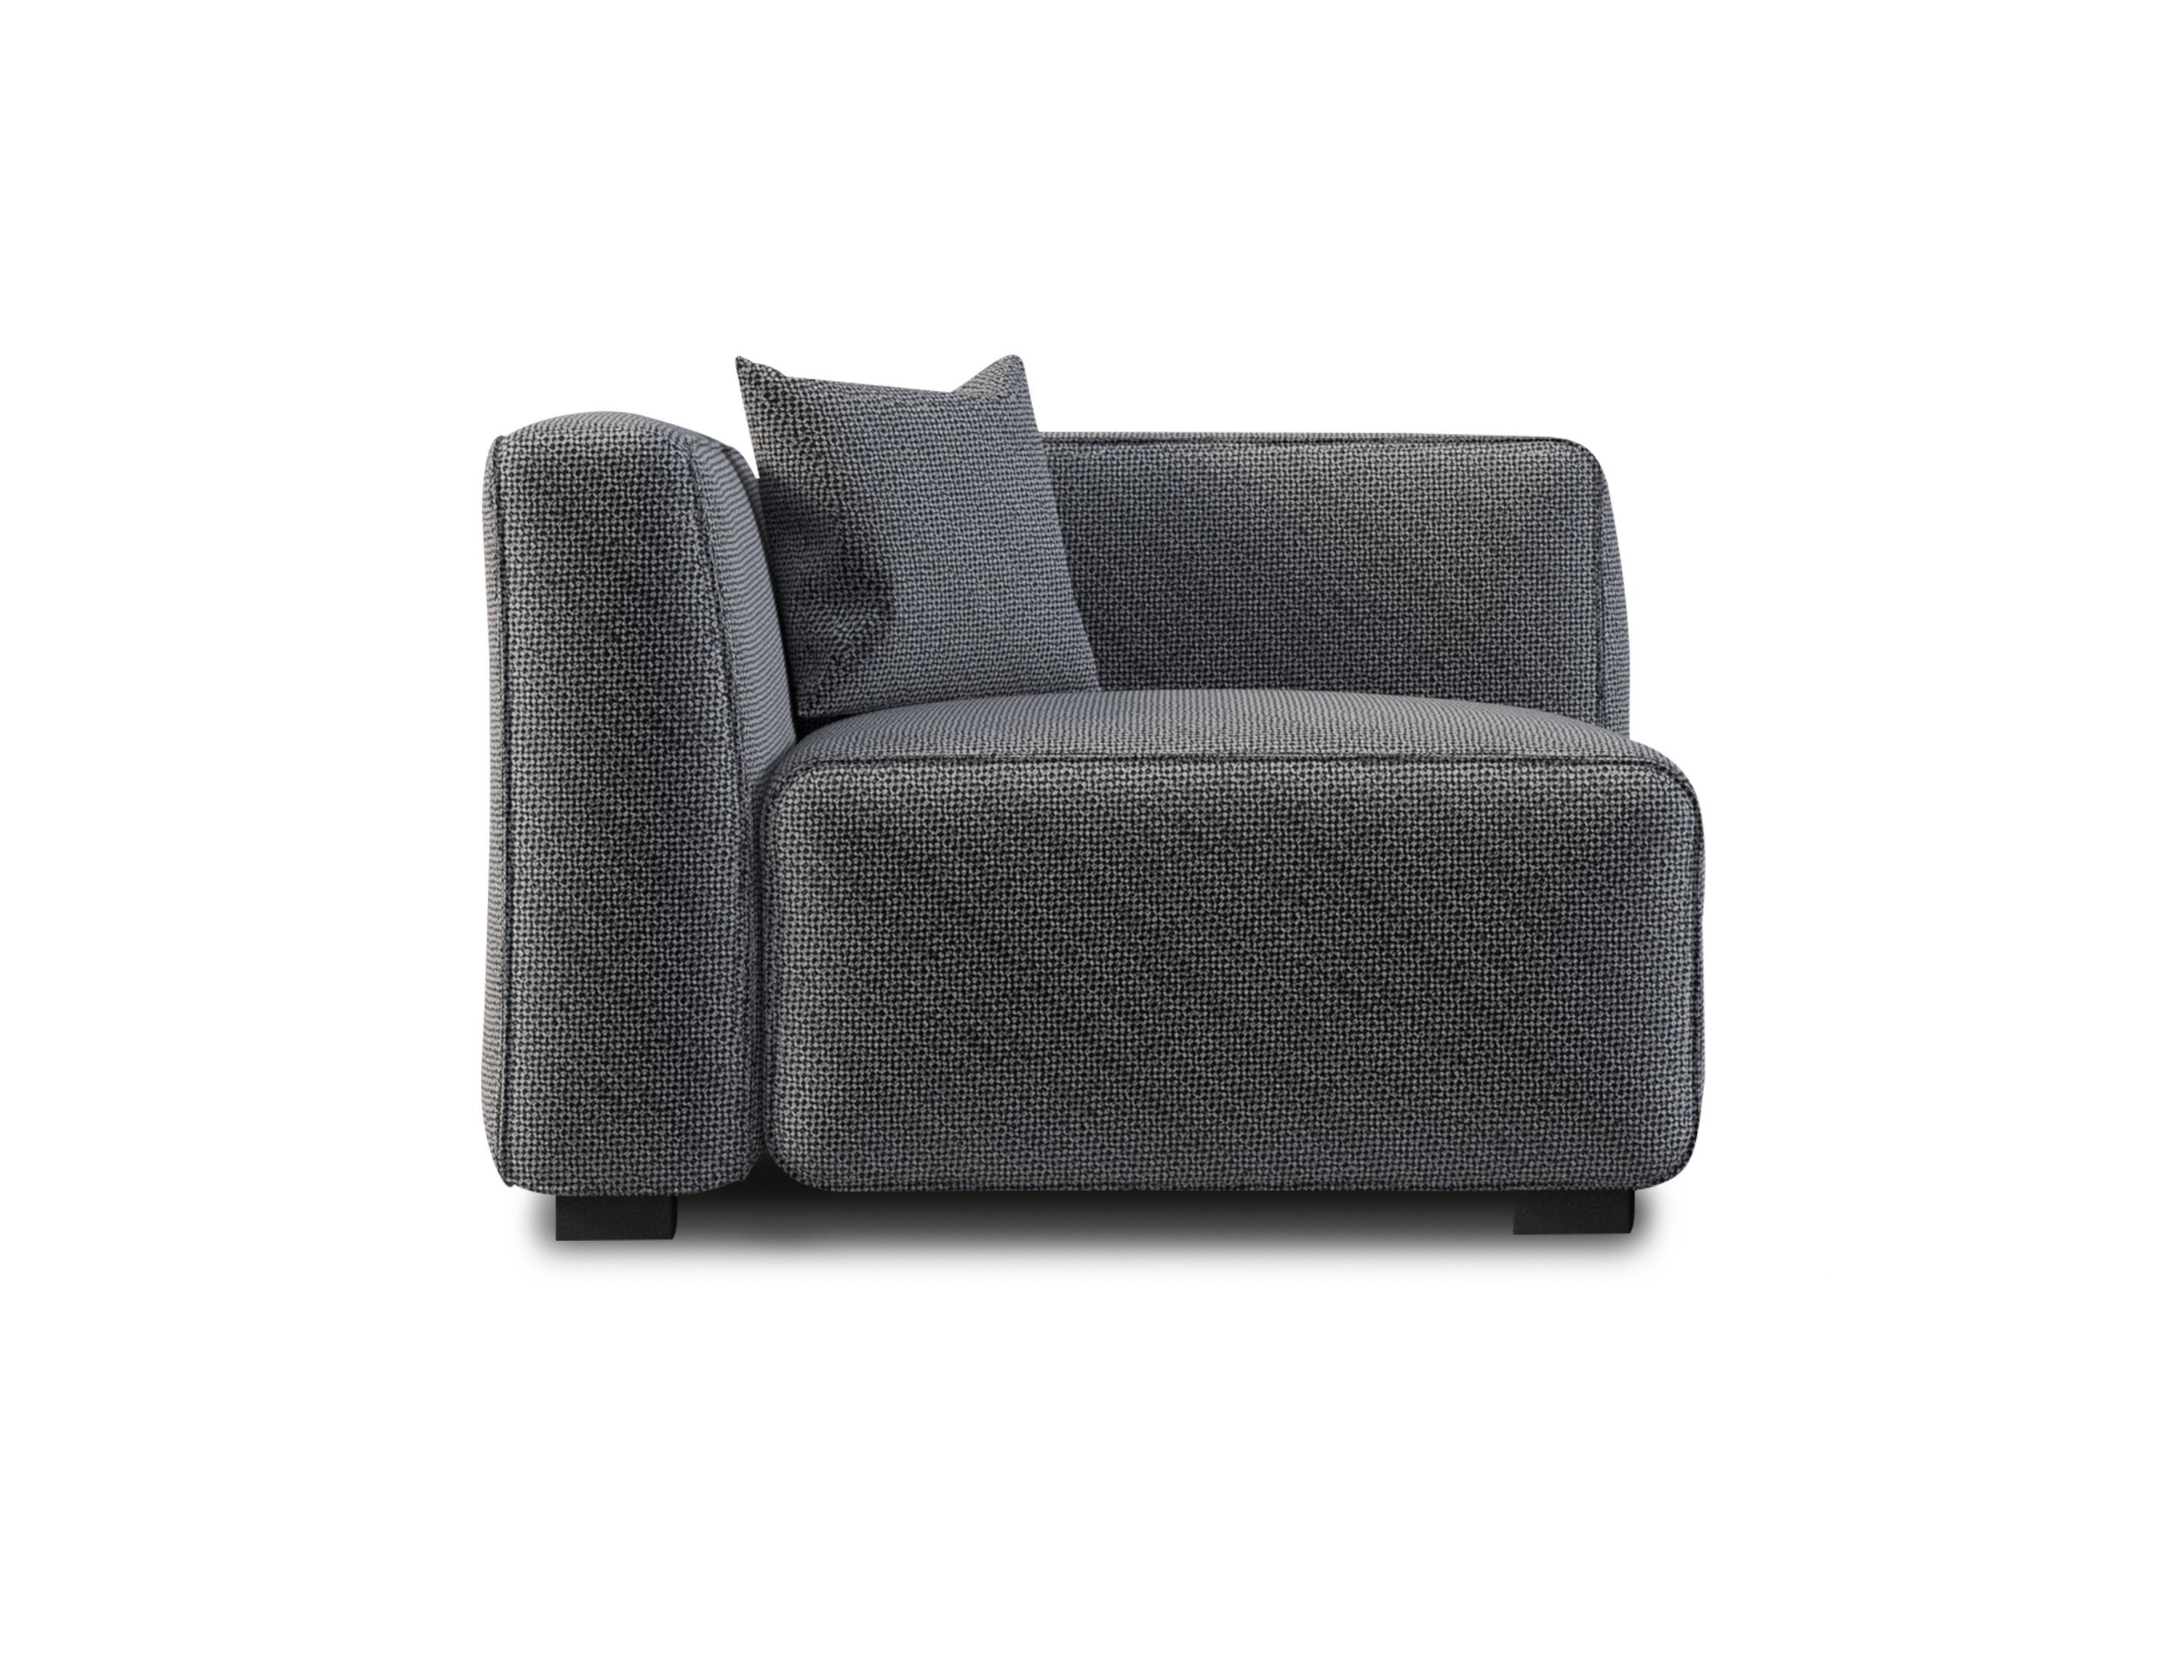 Soft Cube Modern Modular Corner Seat